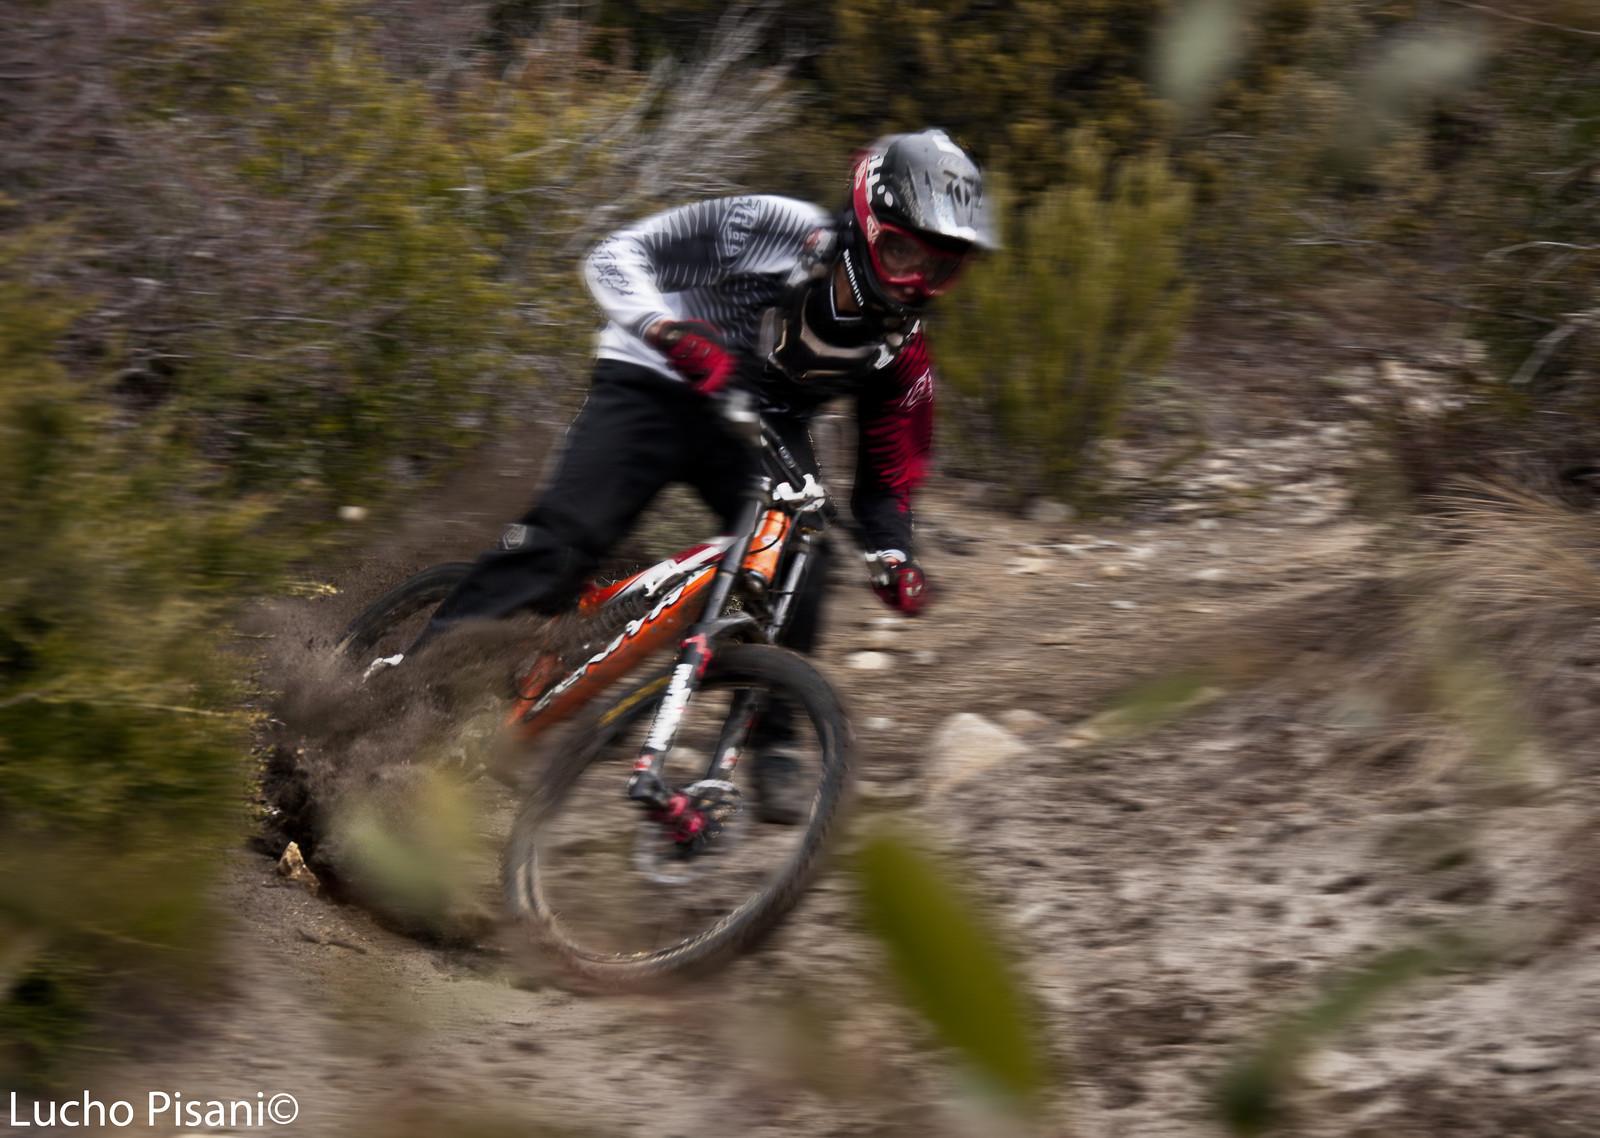 DSC9407 - lucho.pisani - Mountain Biking Pictures - Vital MTB